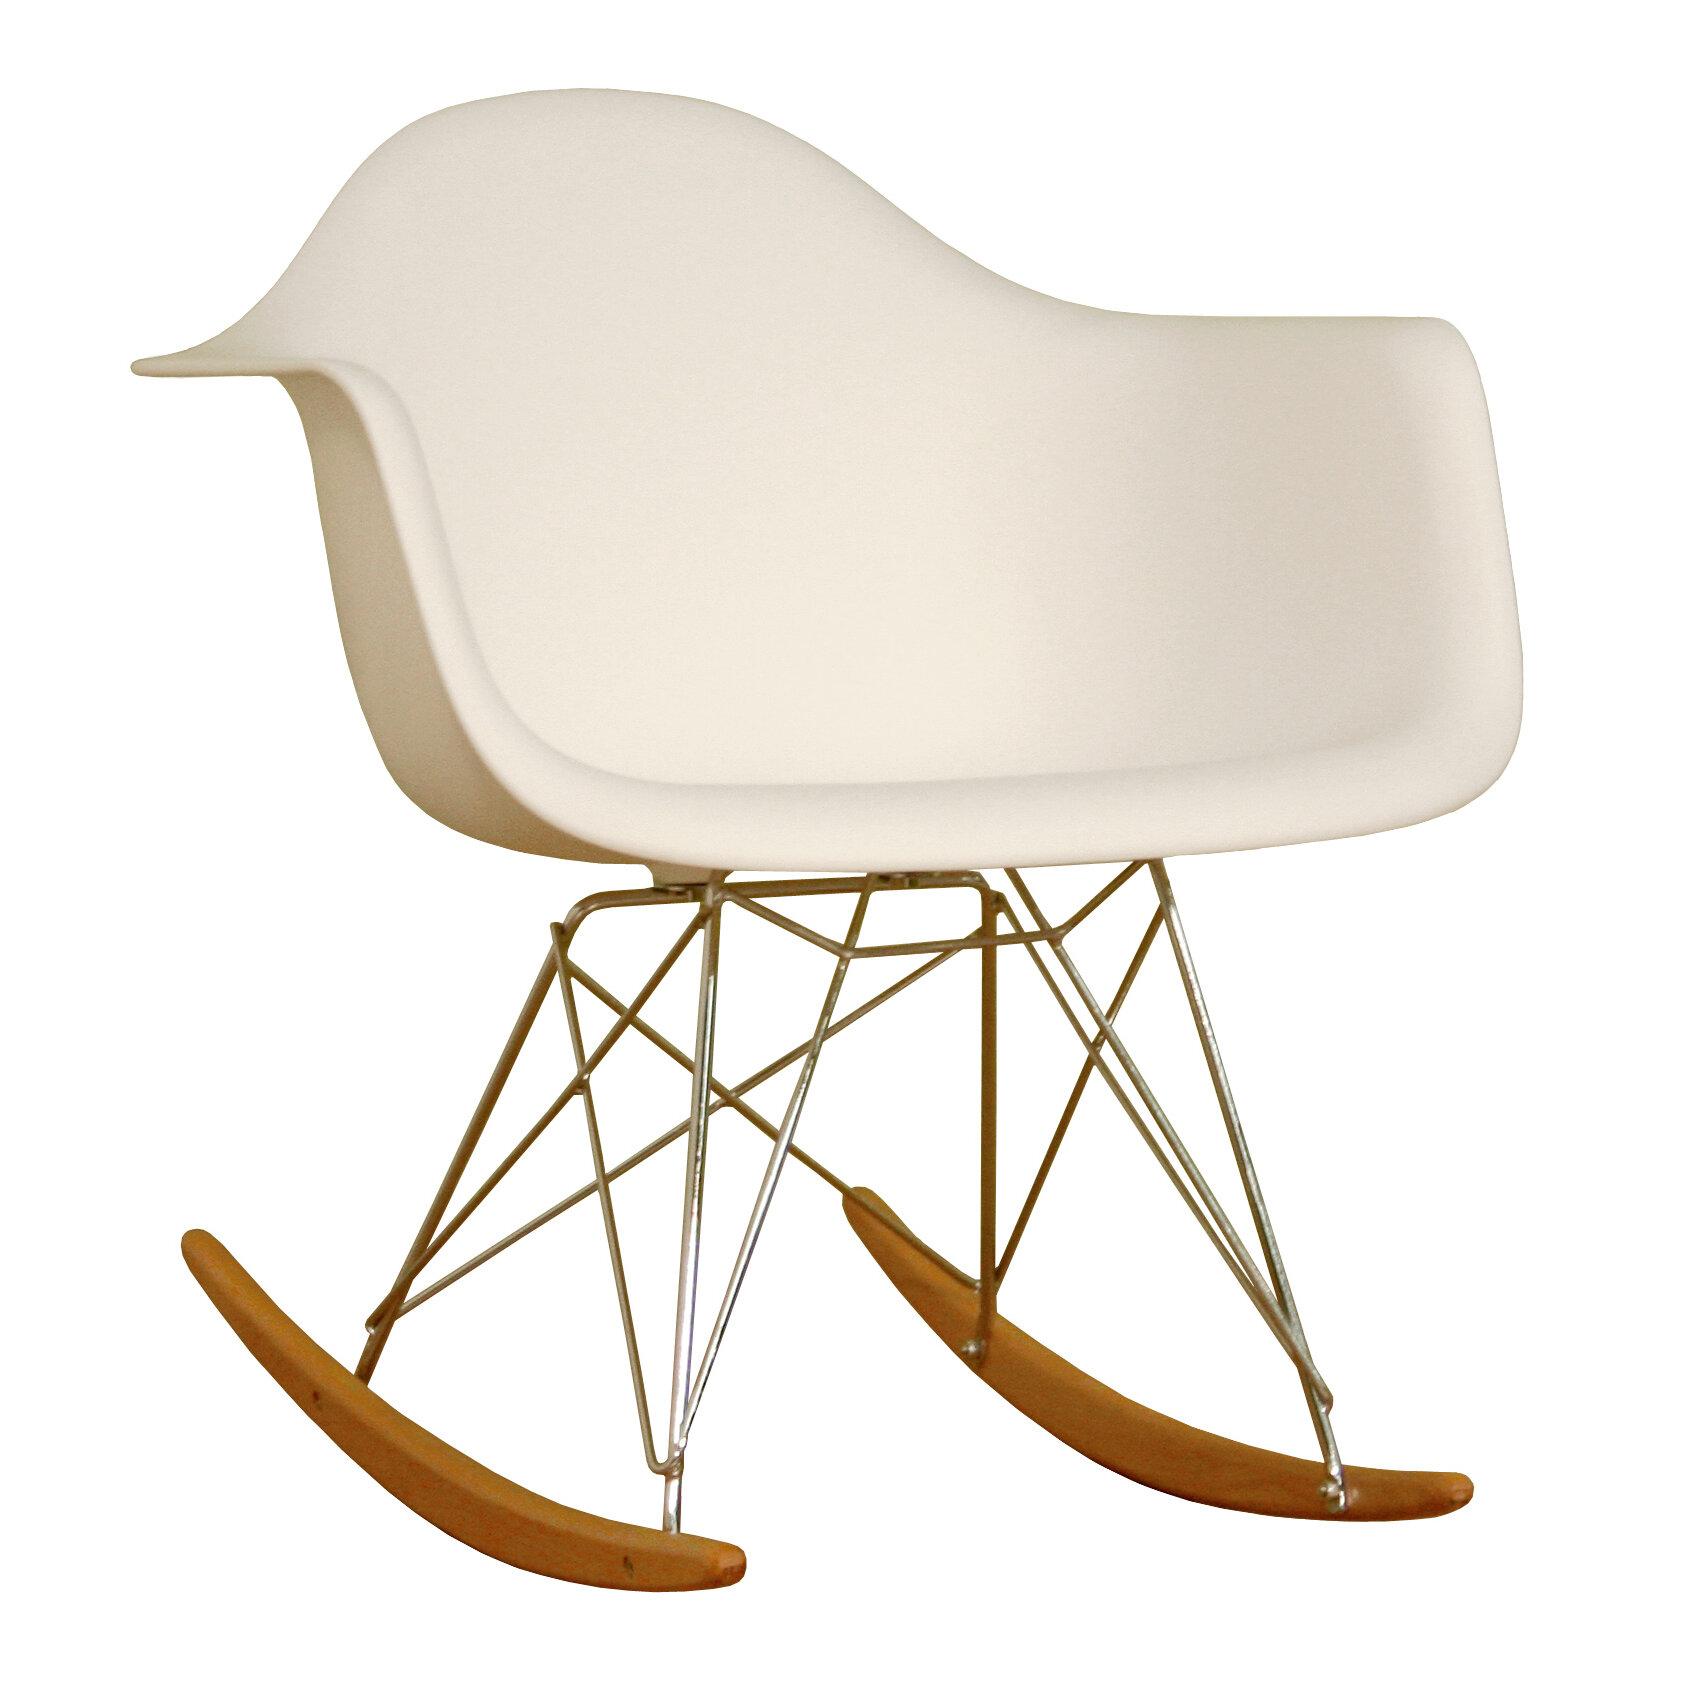 Wholesale Interiors Baxton Studio Mid-Century Modern Rocking Chair u0026 Reviews | Wayfair  sc 1 st  Wayfair & Wholesale Interiors Baxton Studio Mid-Century Modern Rocking Chair ...